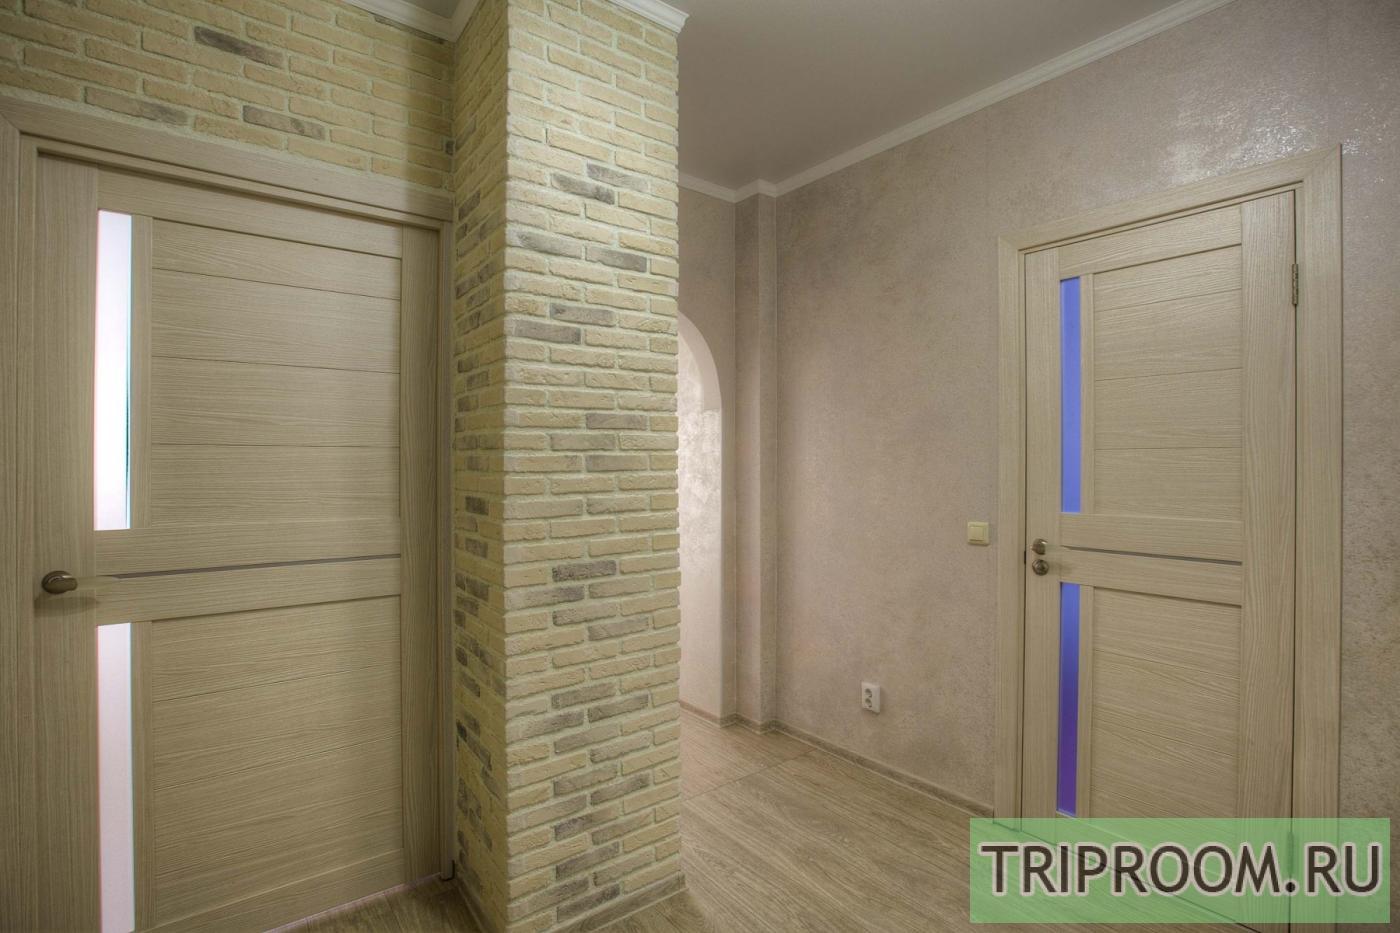 1-комнатная квартира посуточно (вариант № 32786), ул. революции 1905 года, фото № 17